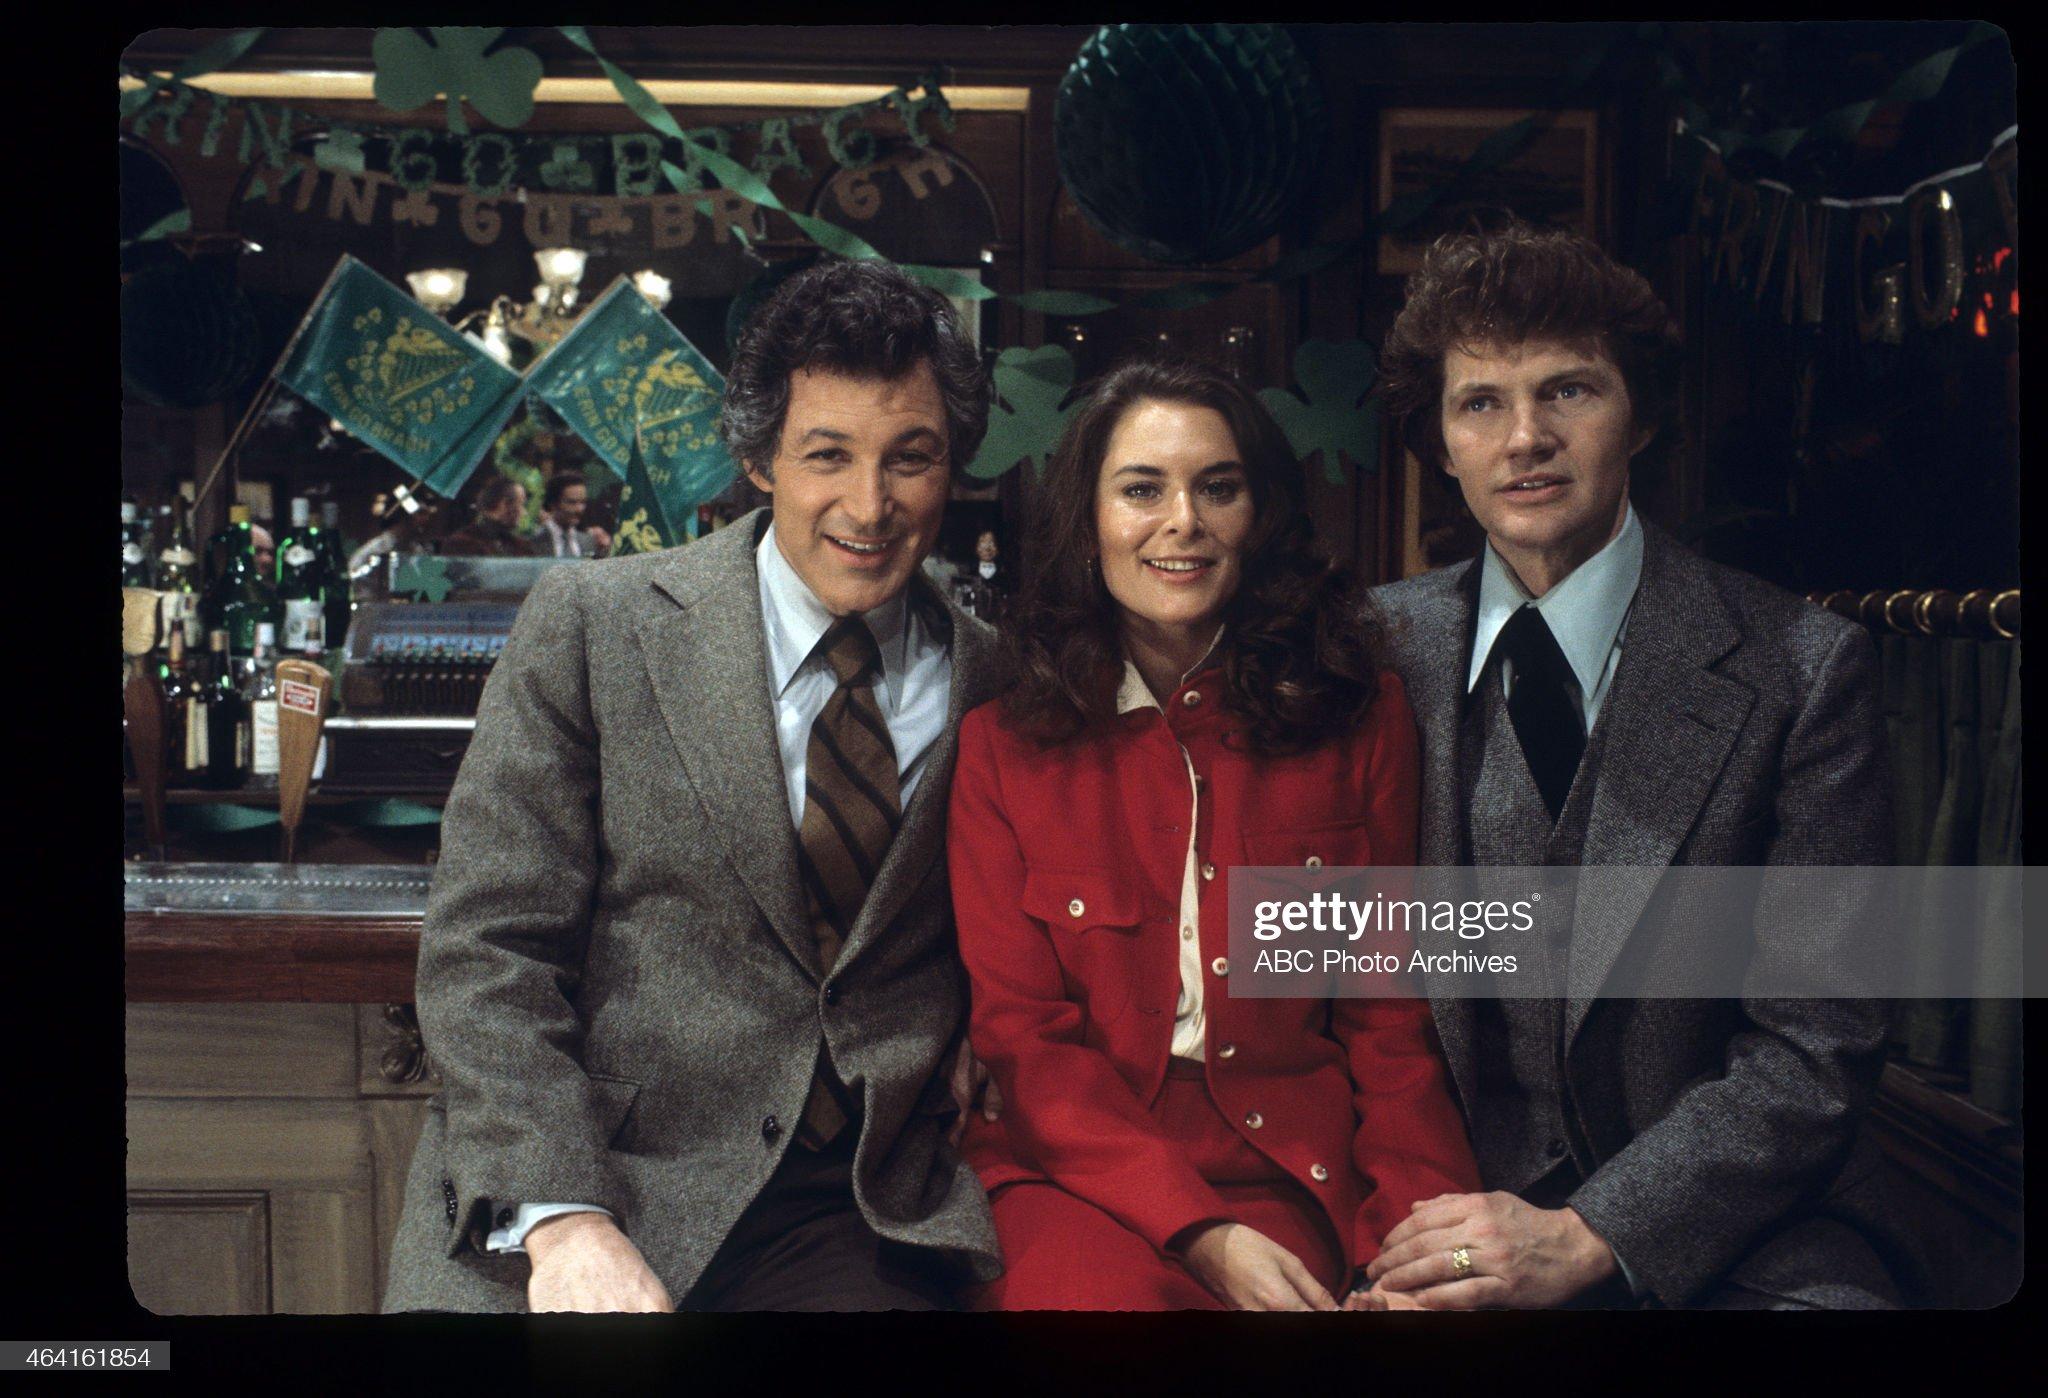 L-R: JOHN GABRIEL;NANCY ADDISON;ANDREW ROBINSON : News Photo